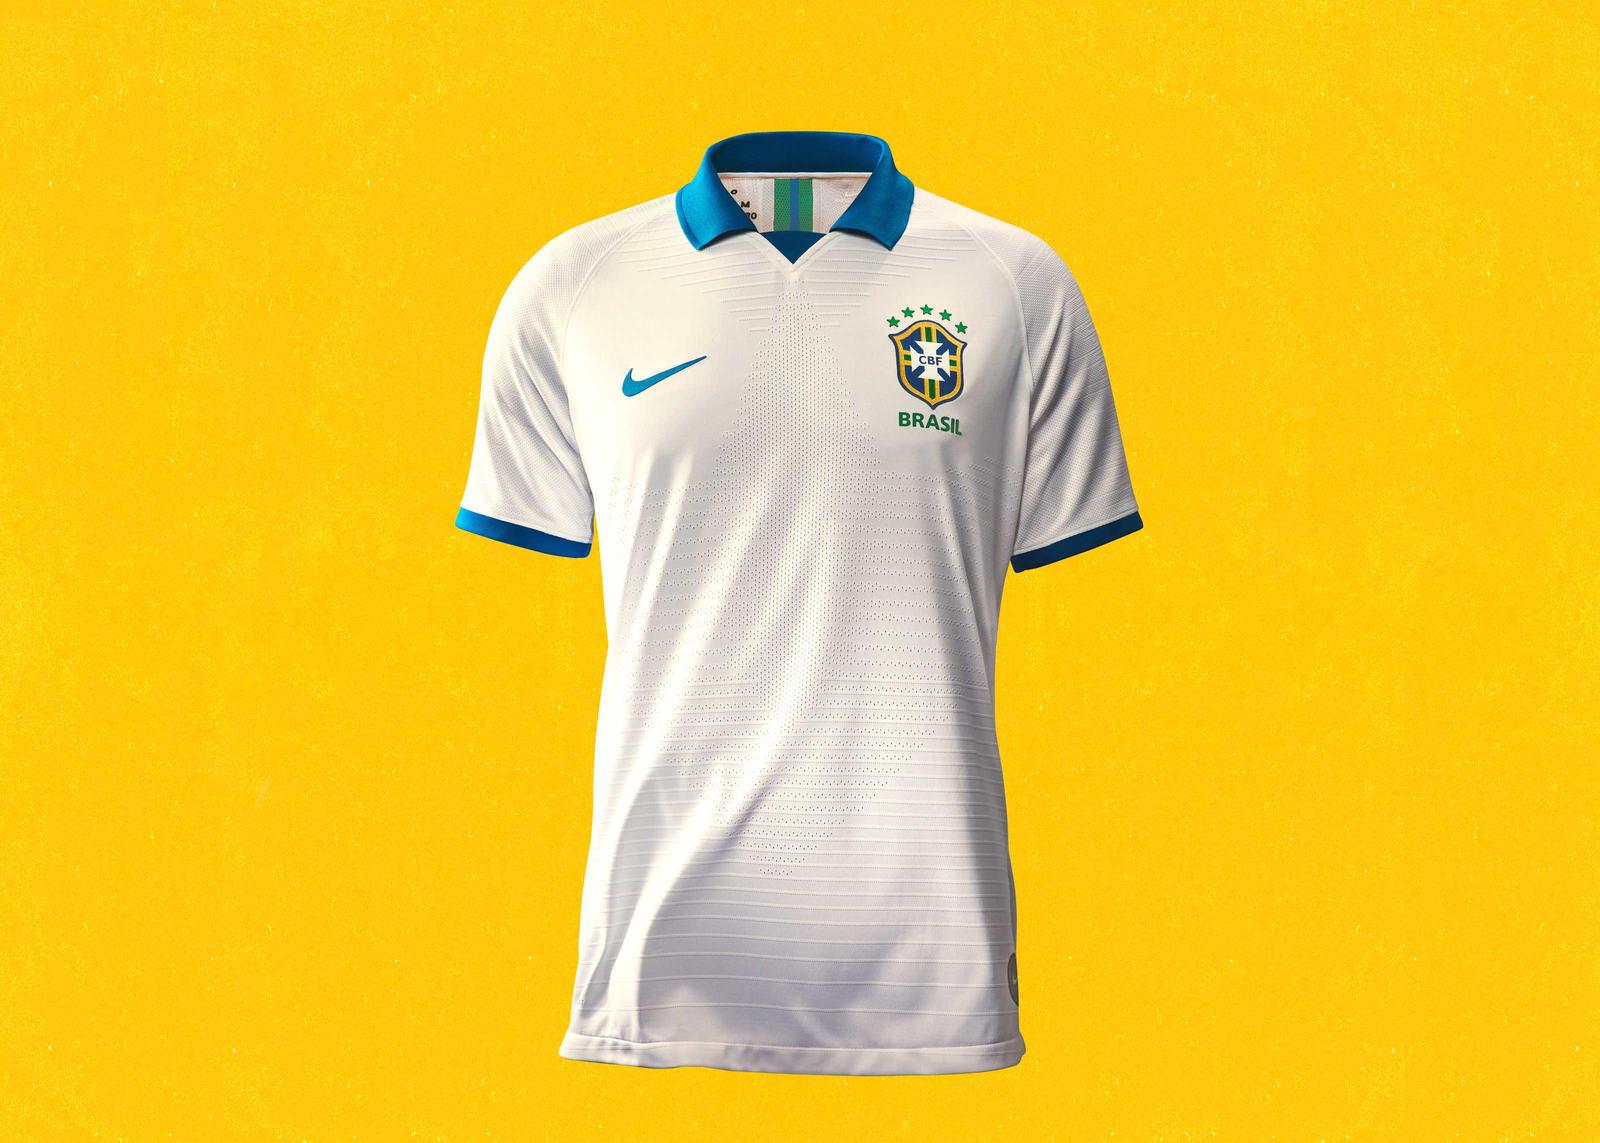 Nike 2019-20 Brasil Copa America 100th Anniversary Jersey Seleção Brasileira Collection 5